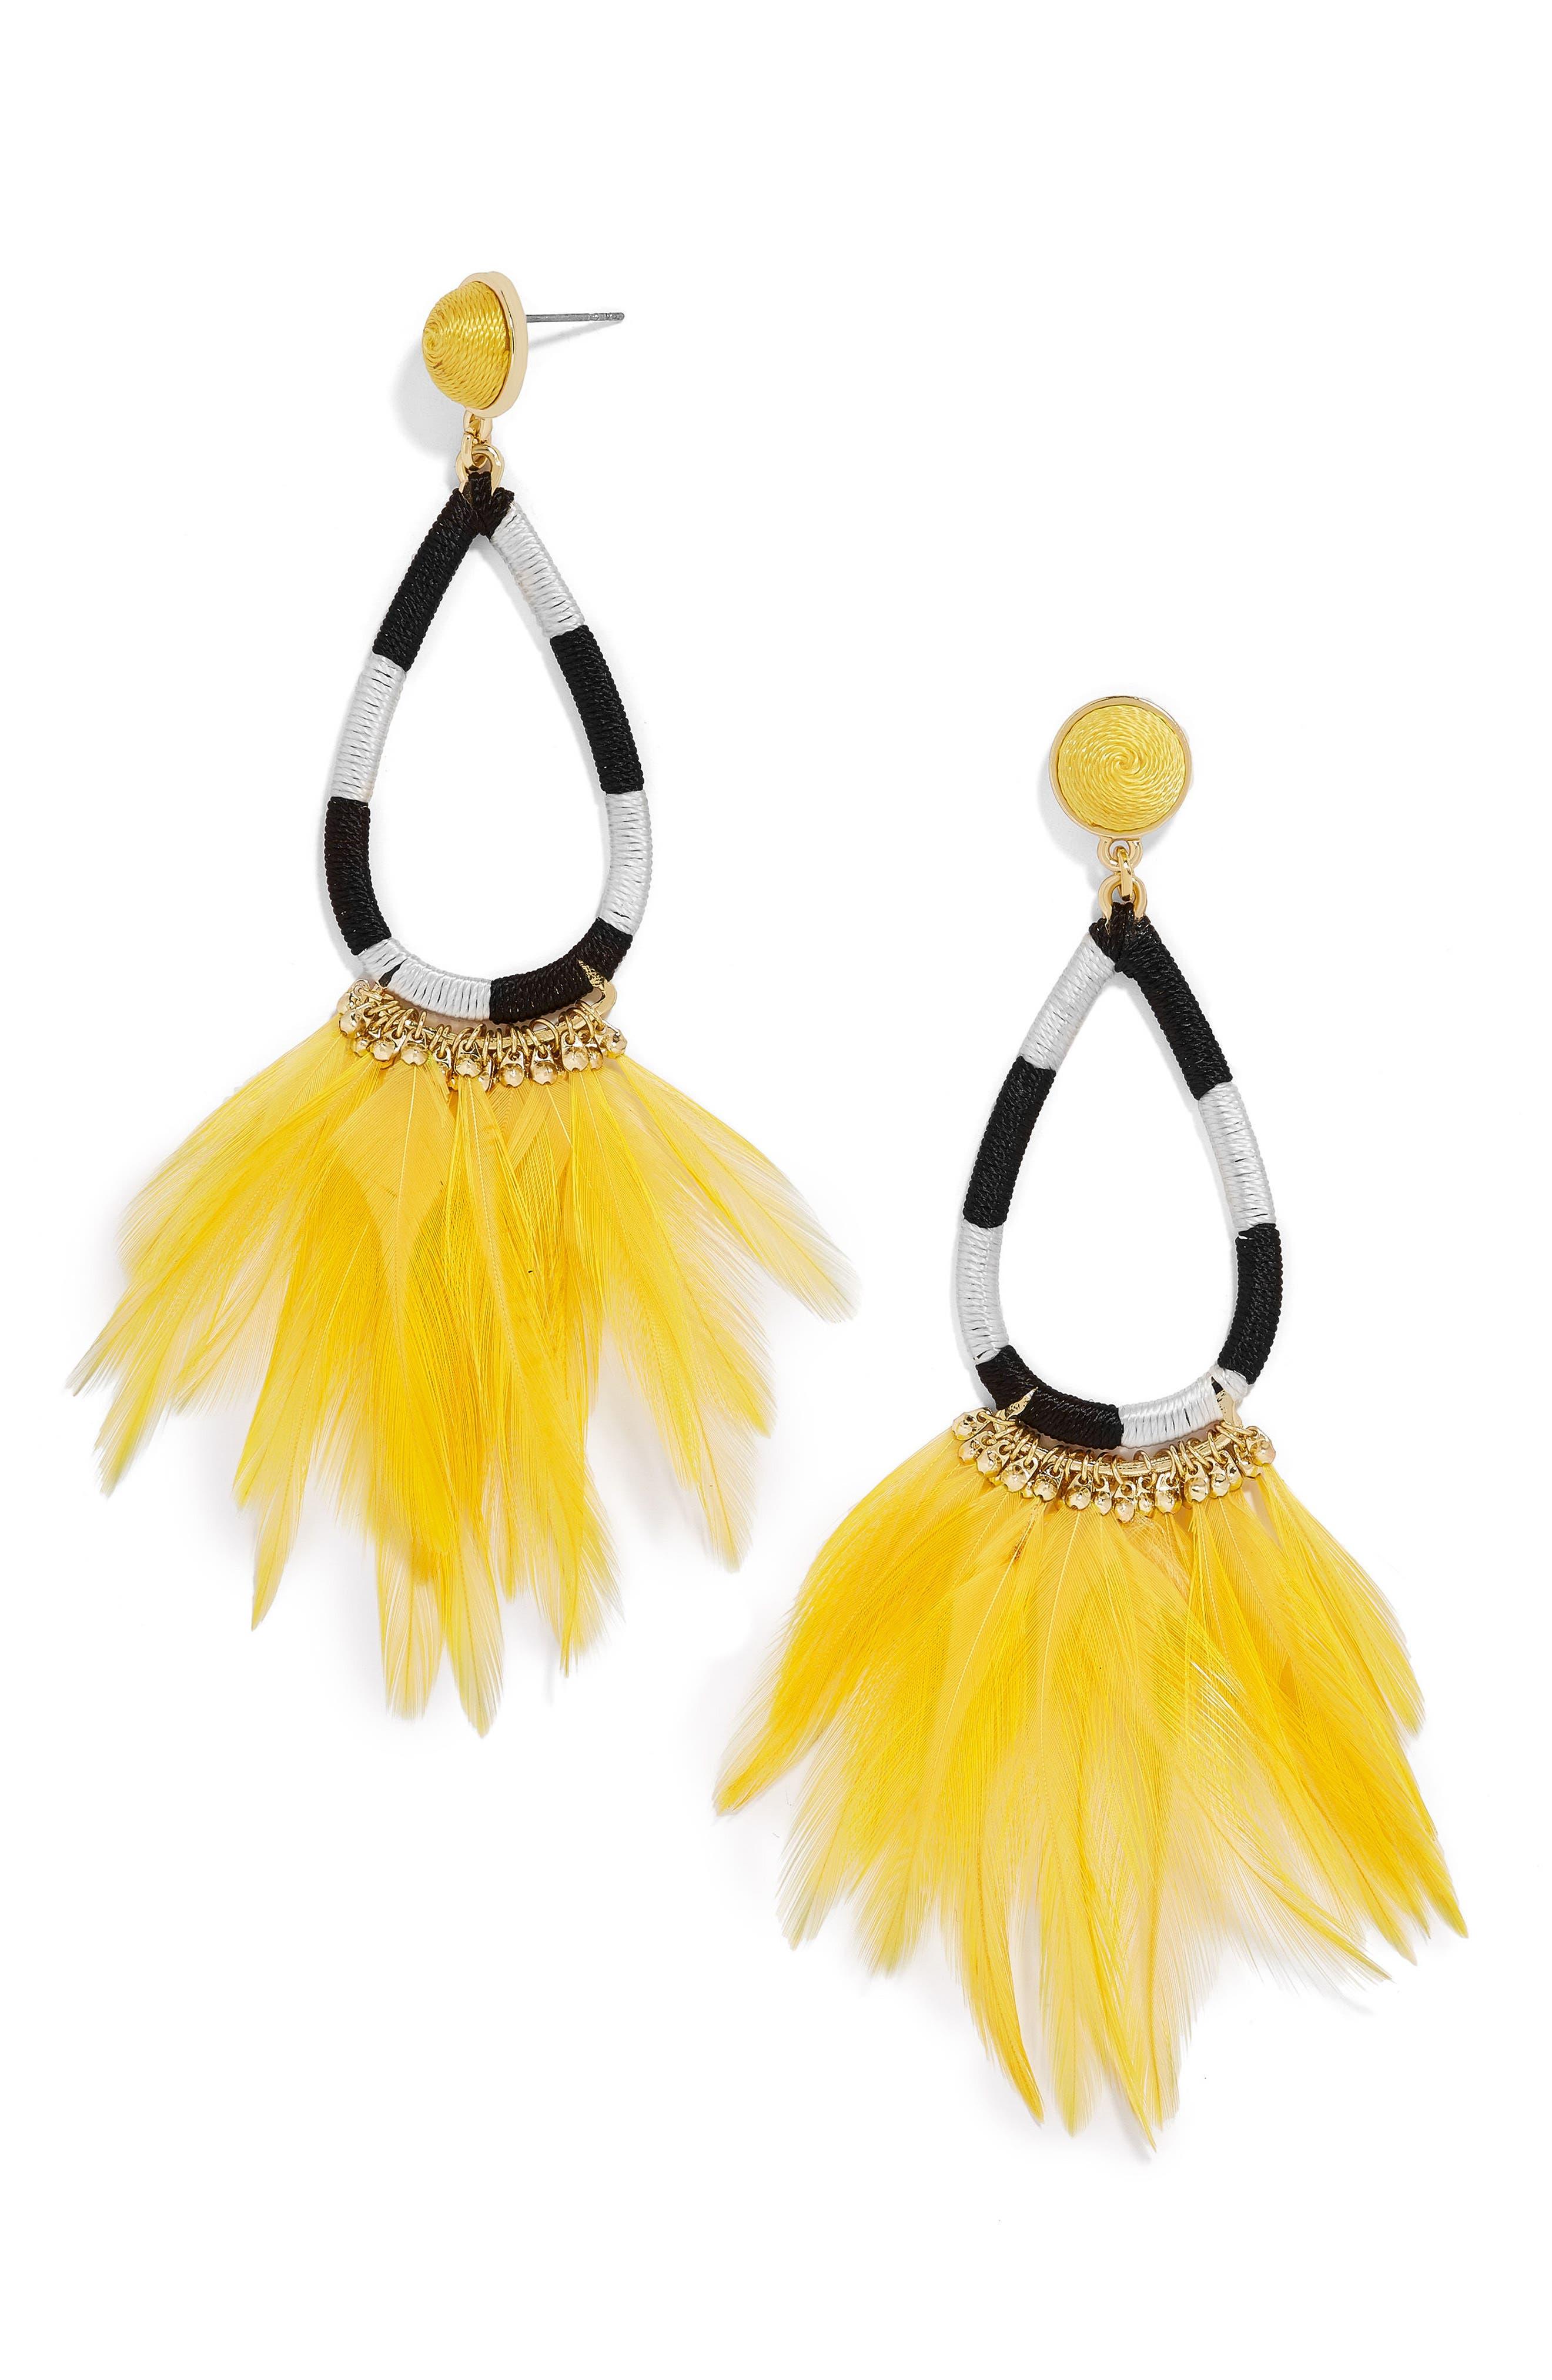 Alternate Image 1 Selected - BaubleBar Marigold Feather Shoulder Duster Earrings